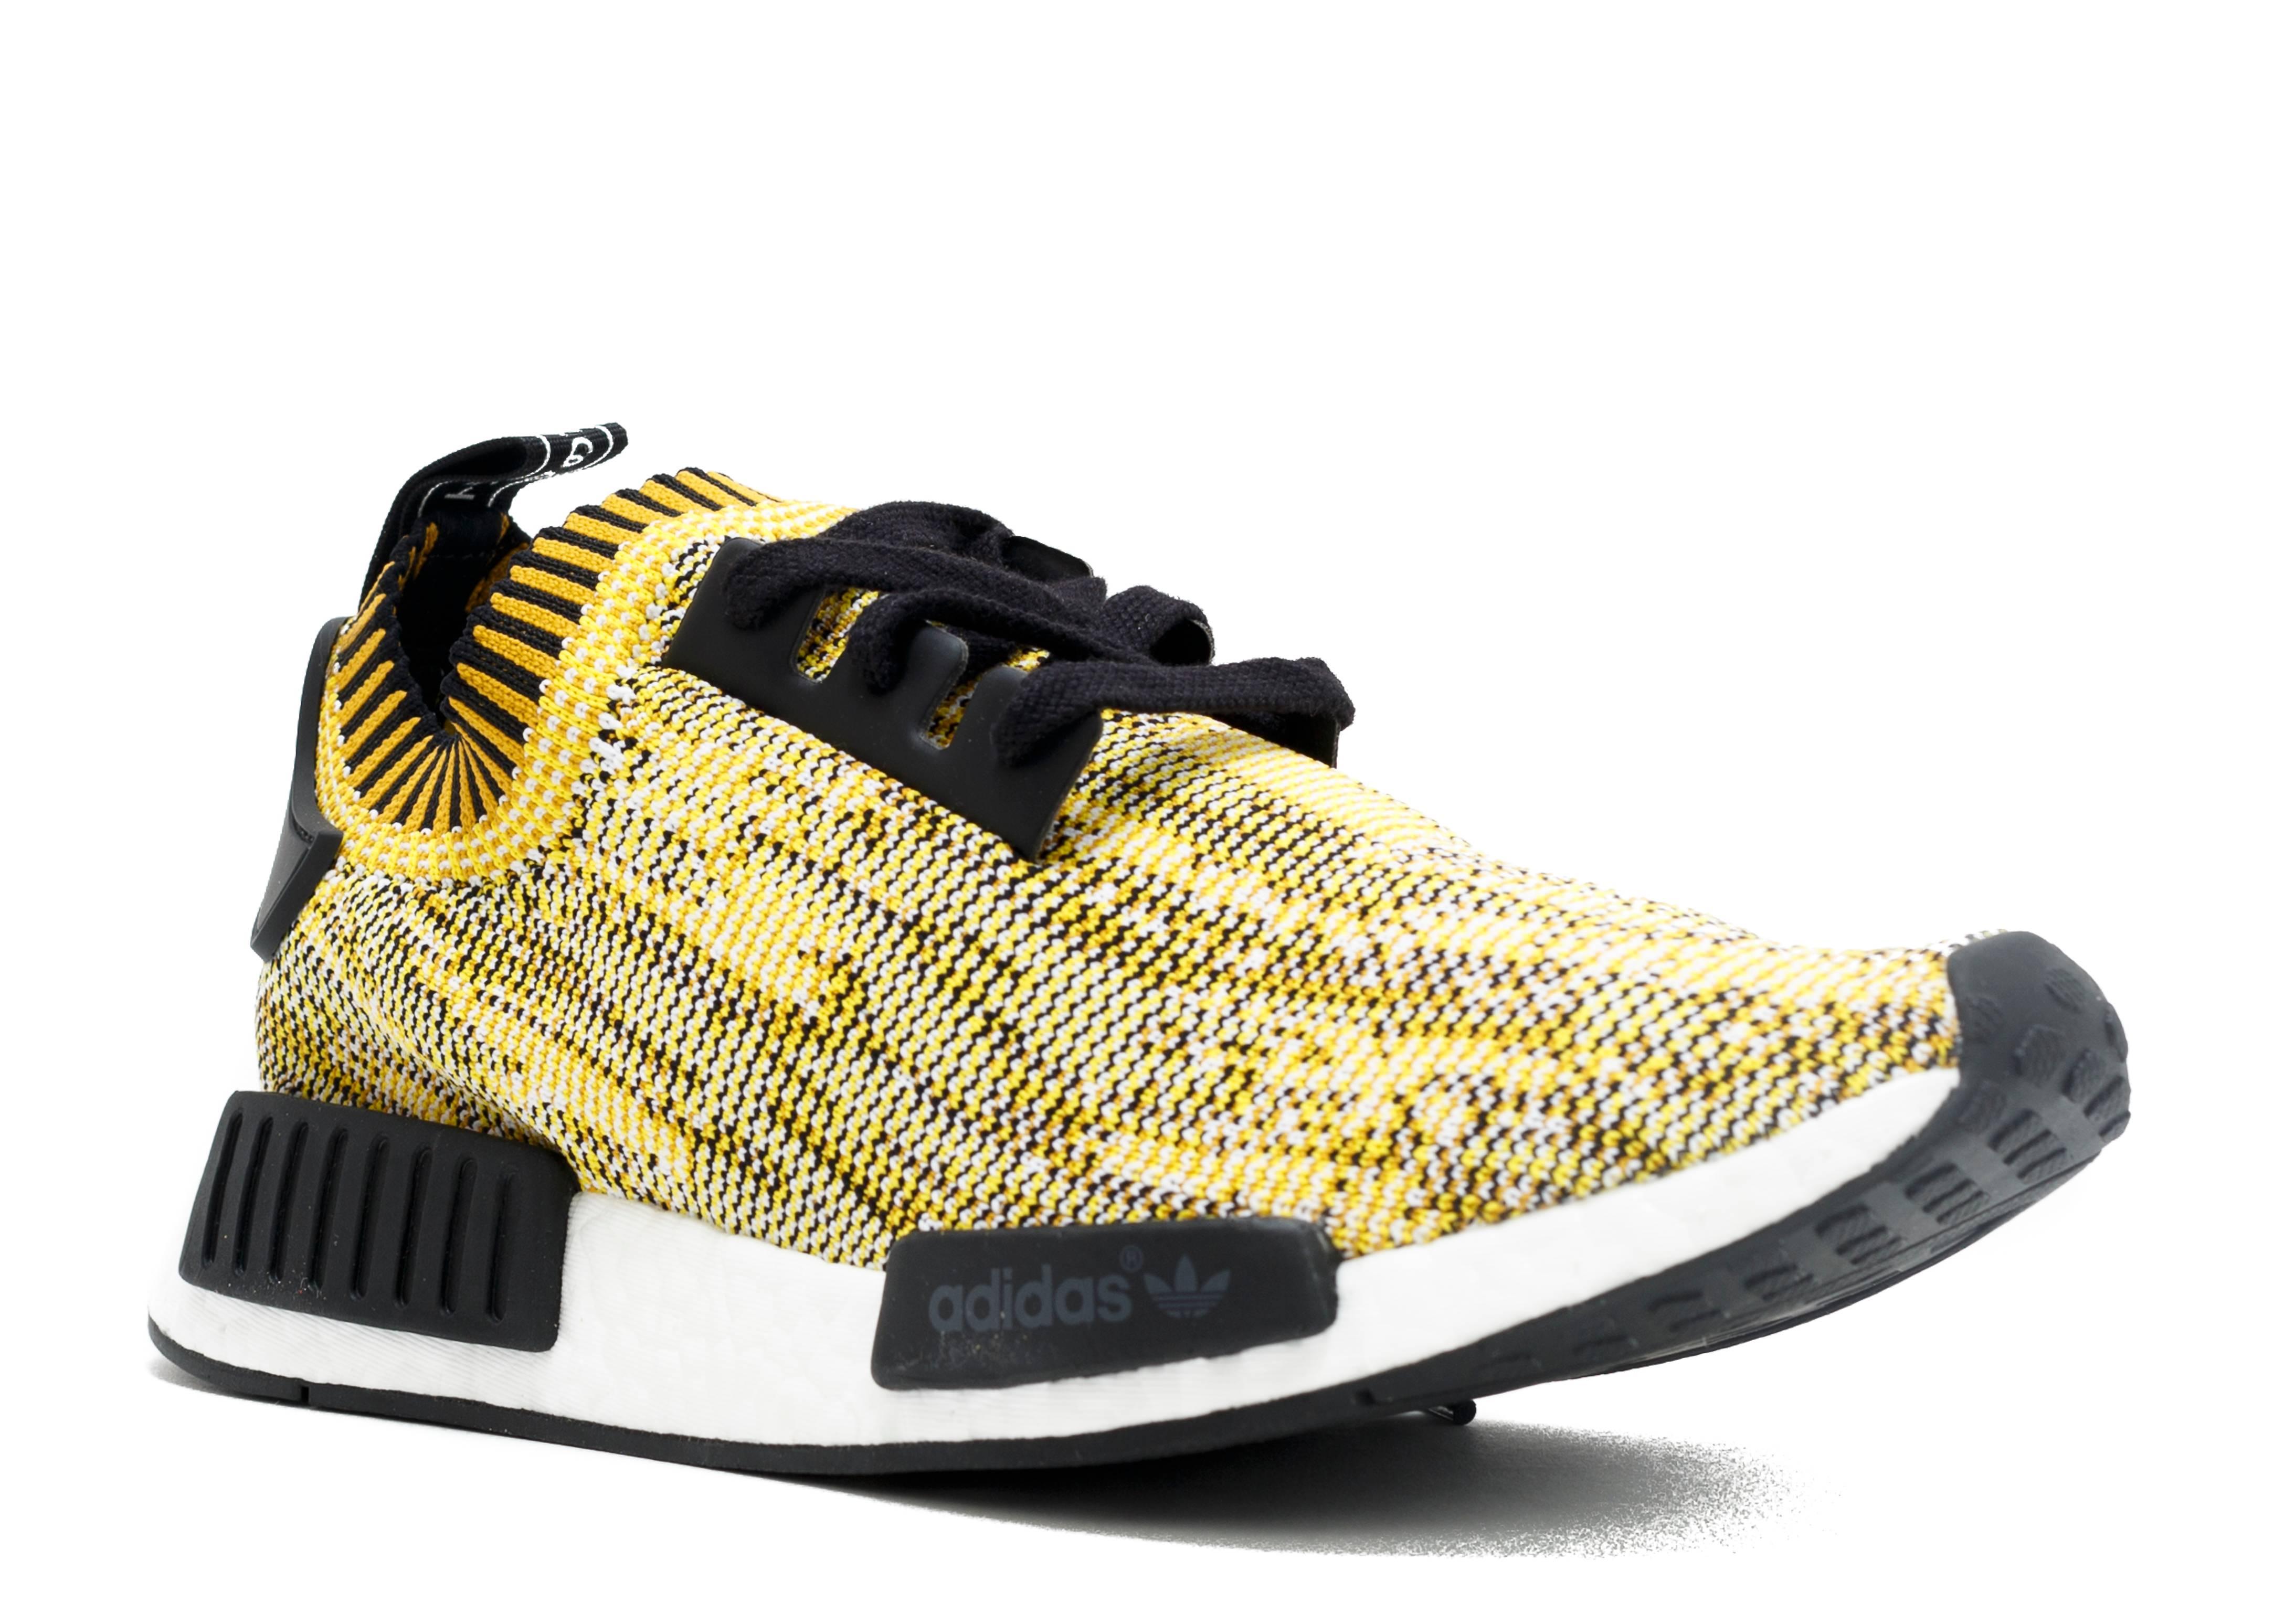 adidas nmd gold